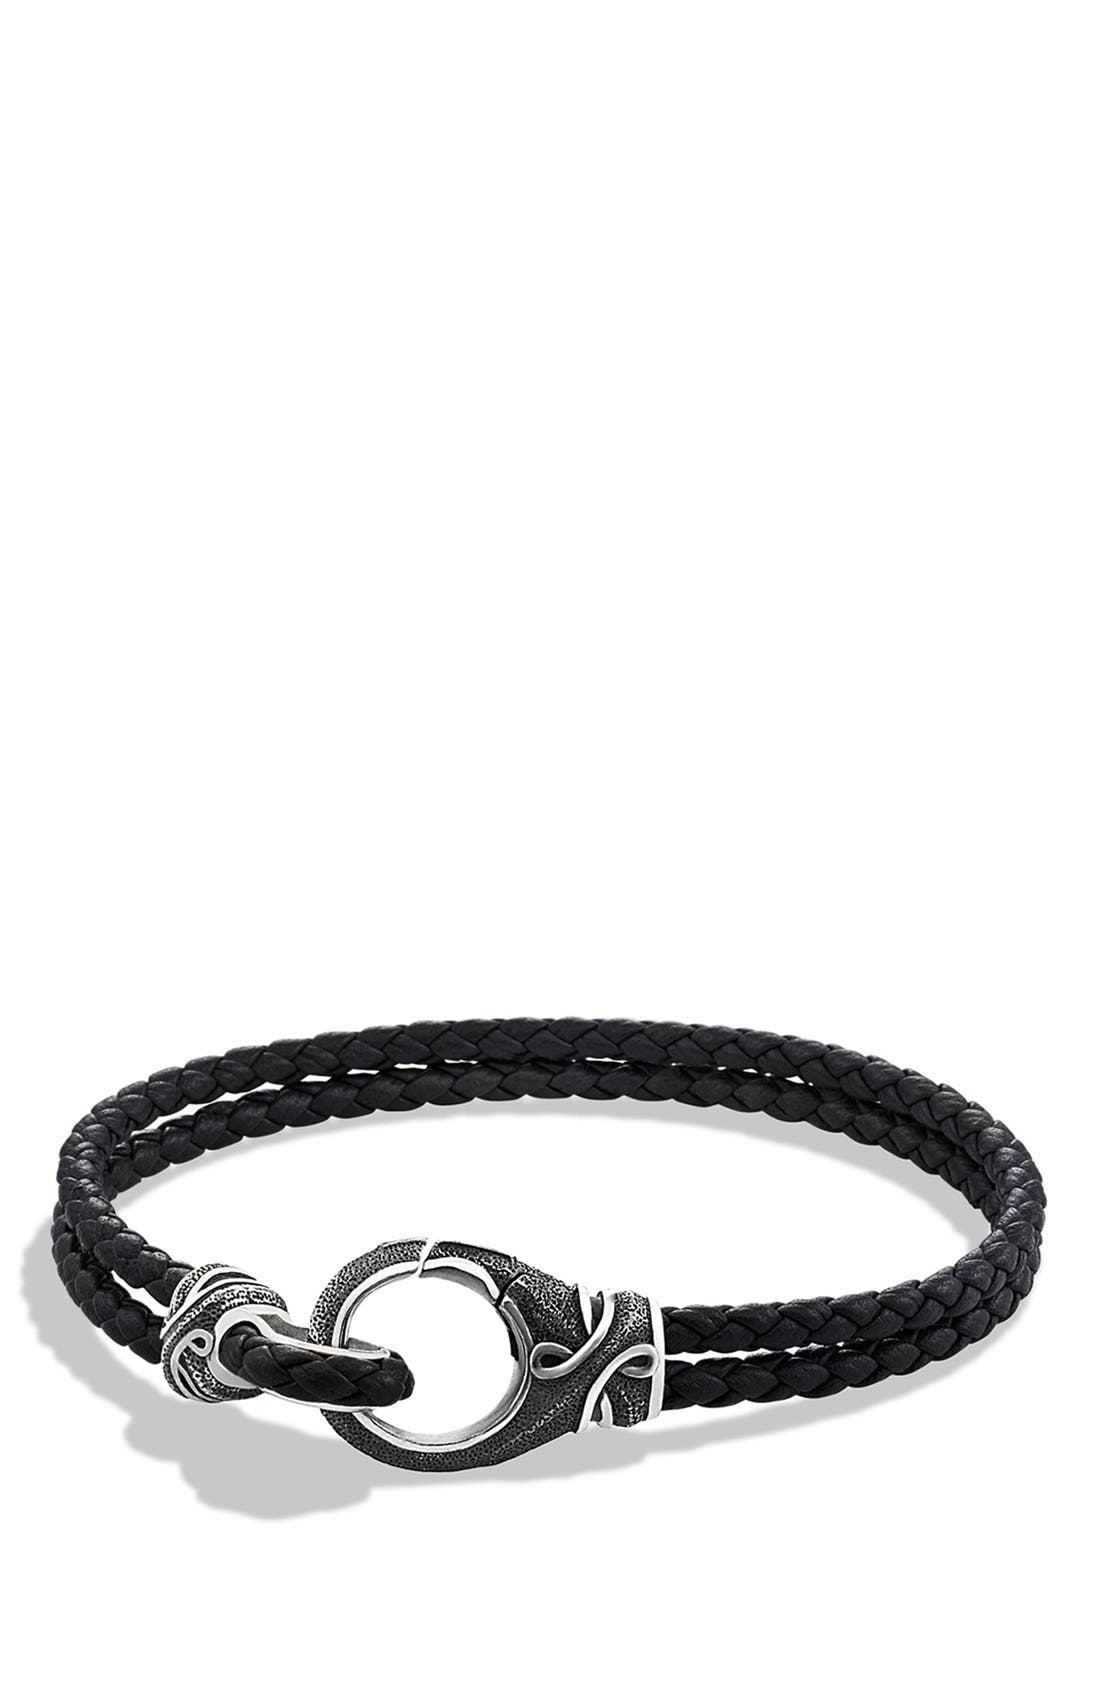 Main Image - David Yurman 'Armory' Two-Row Bracelet